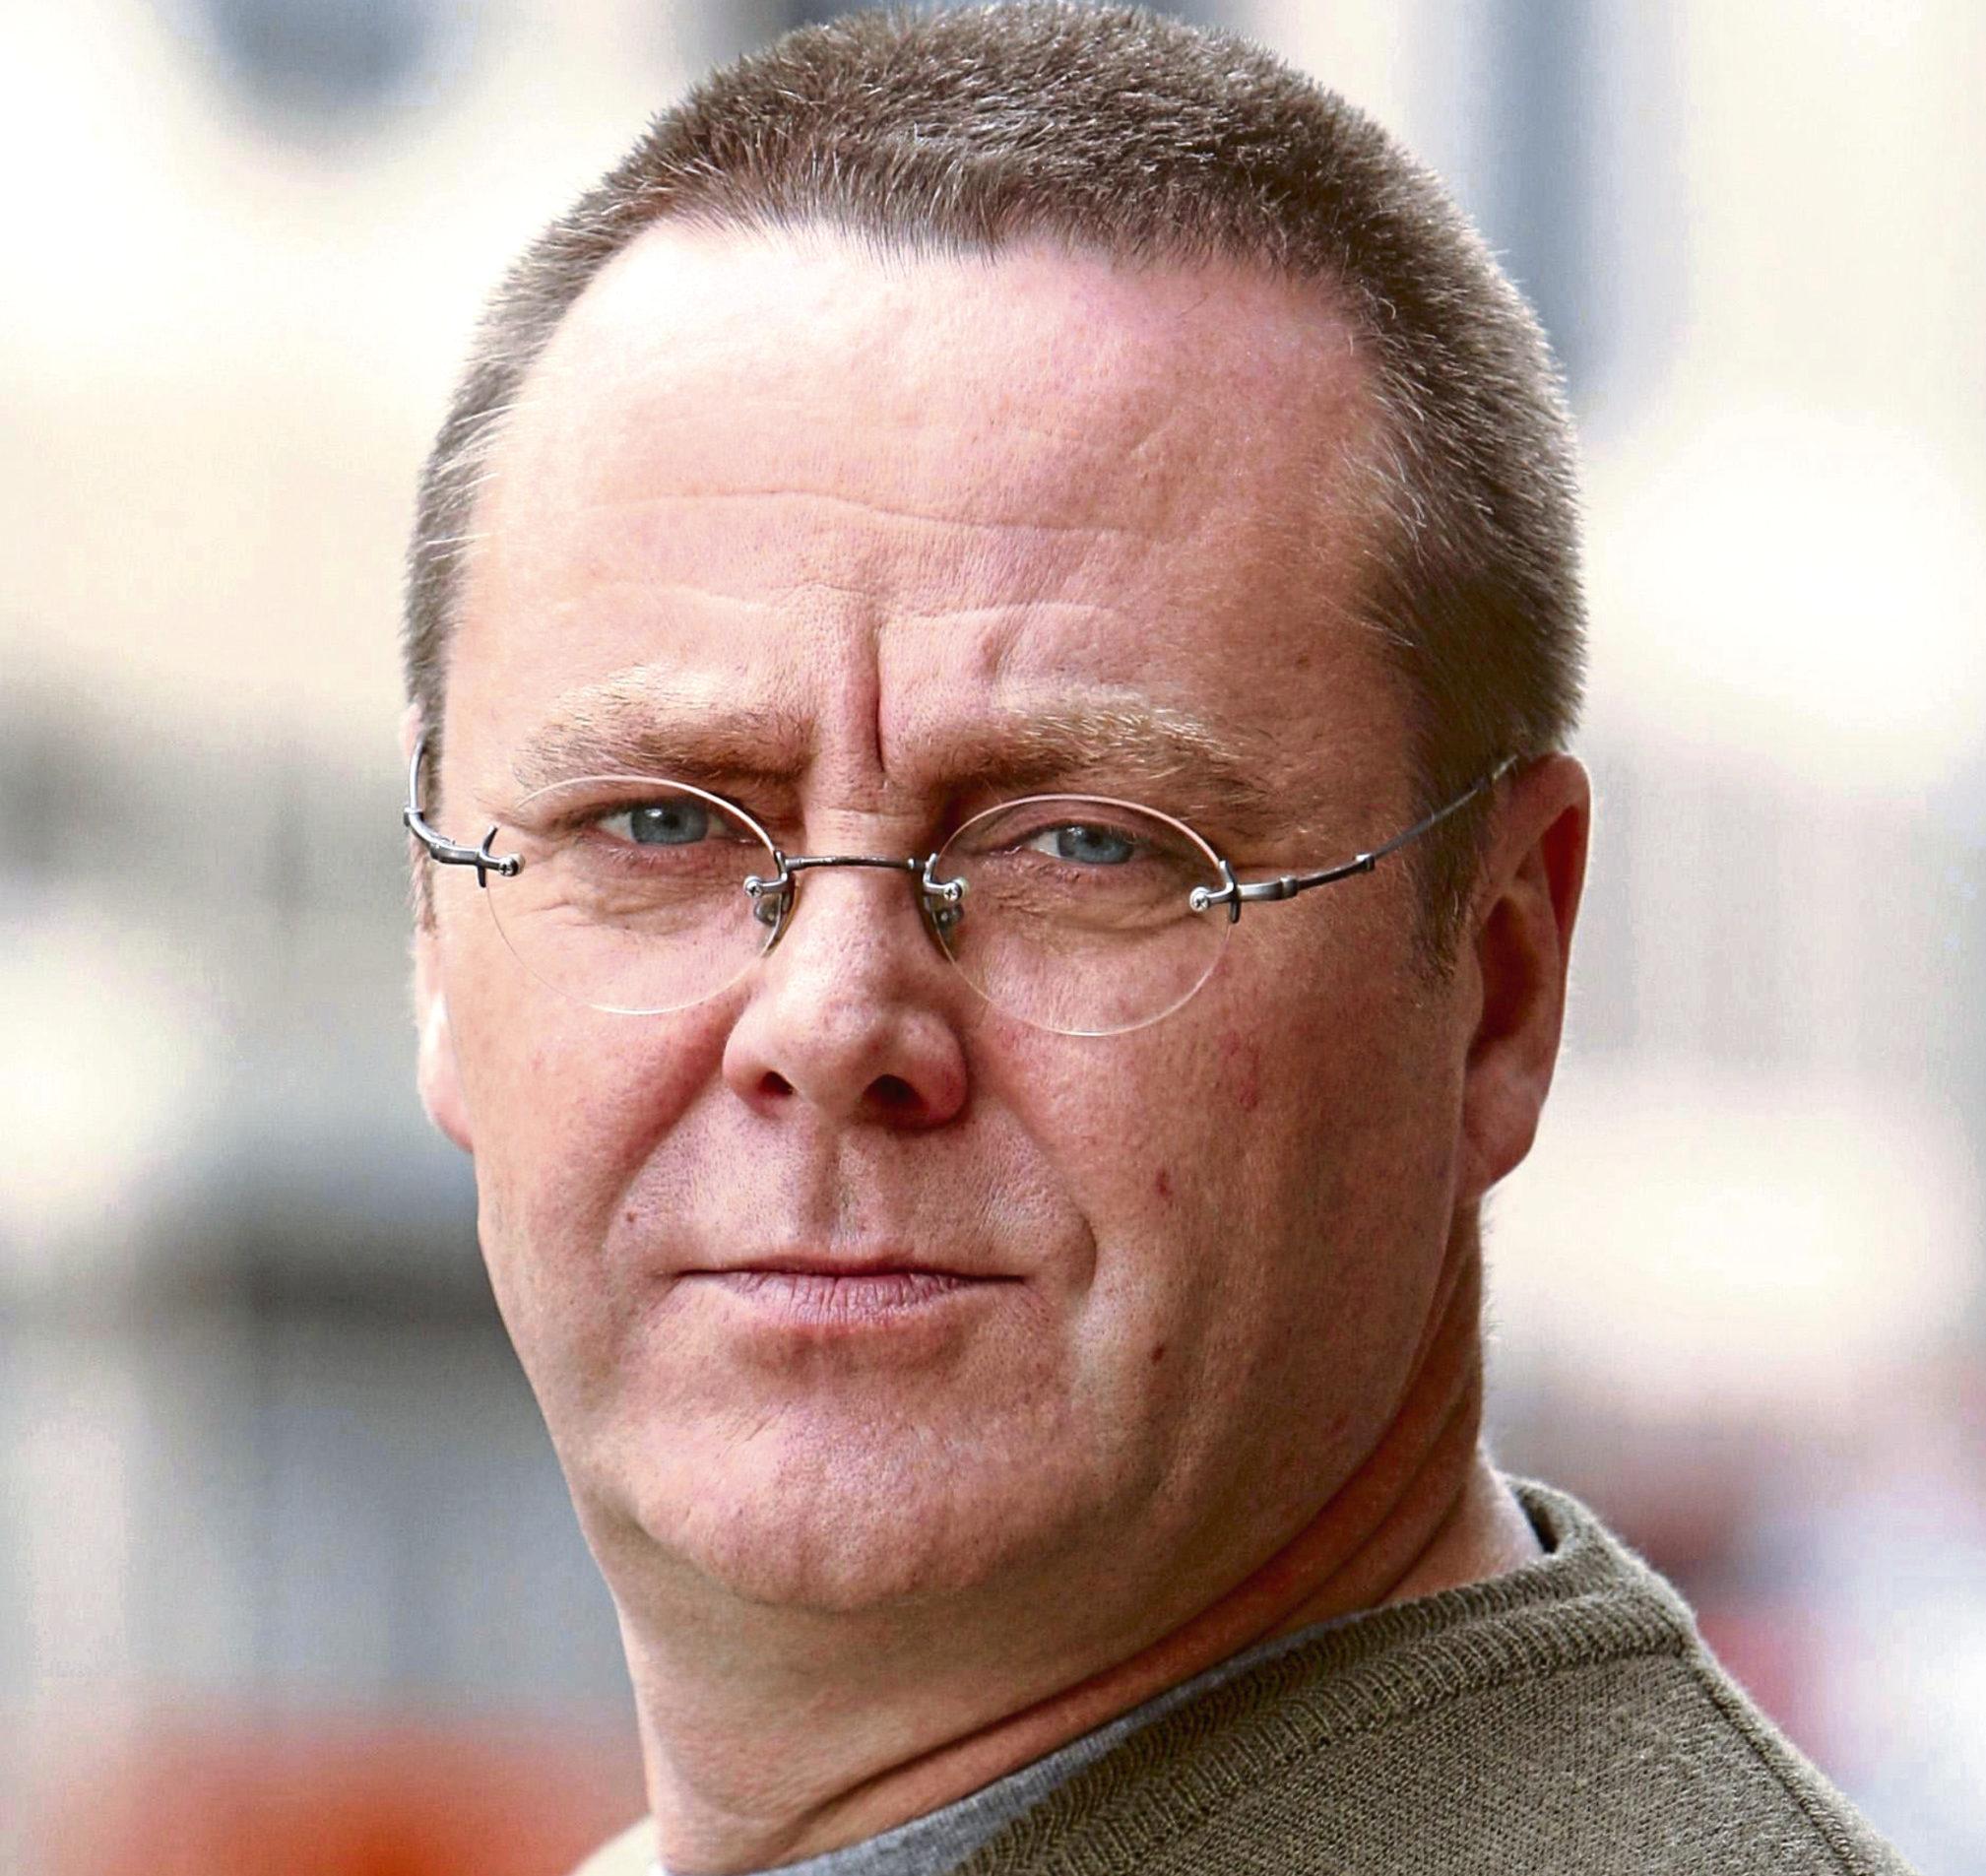 Jake Molloy, RMT regional organiser.